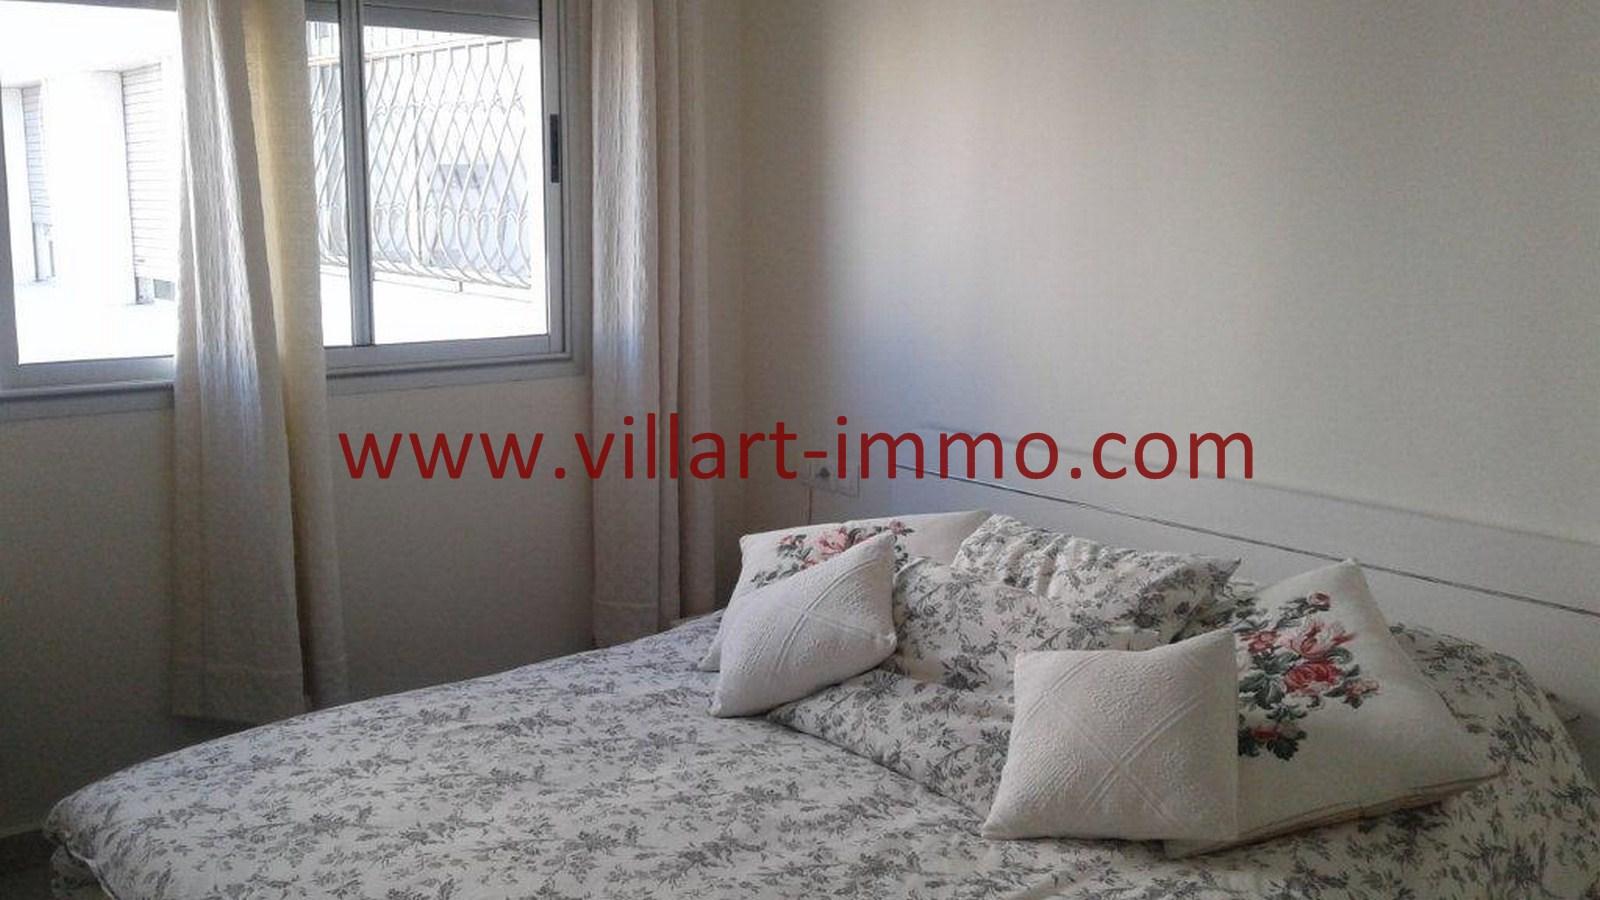 2-A vendre-Appartement-Tanger-Castilla-Chambre 1-VA473-Villart immo-Agence Immobilière